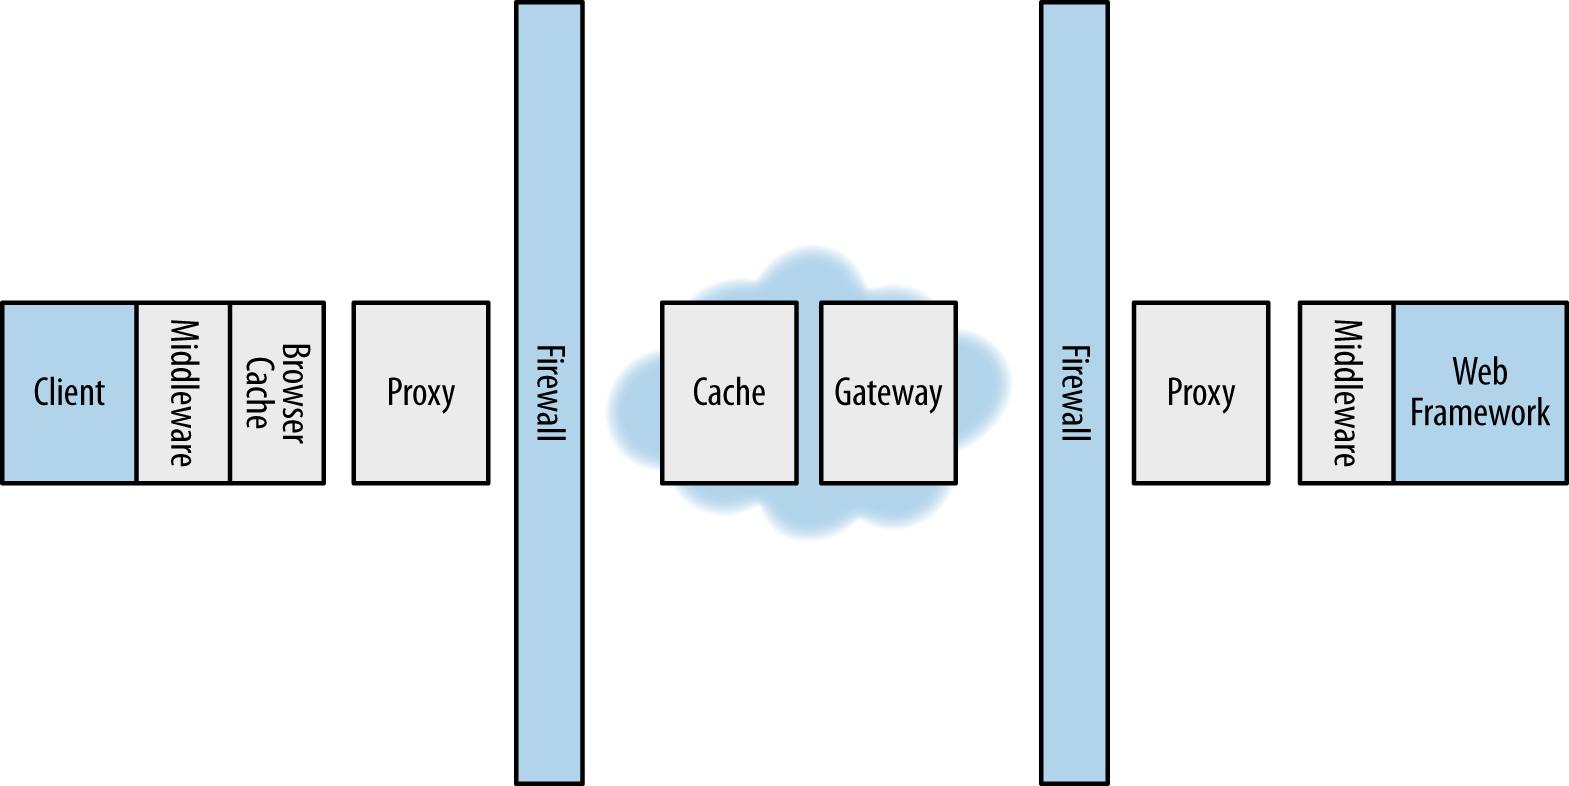 HTTP intermediaries